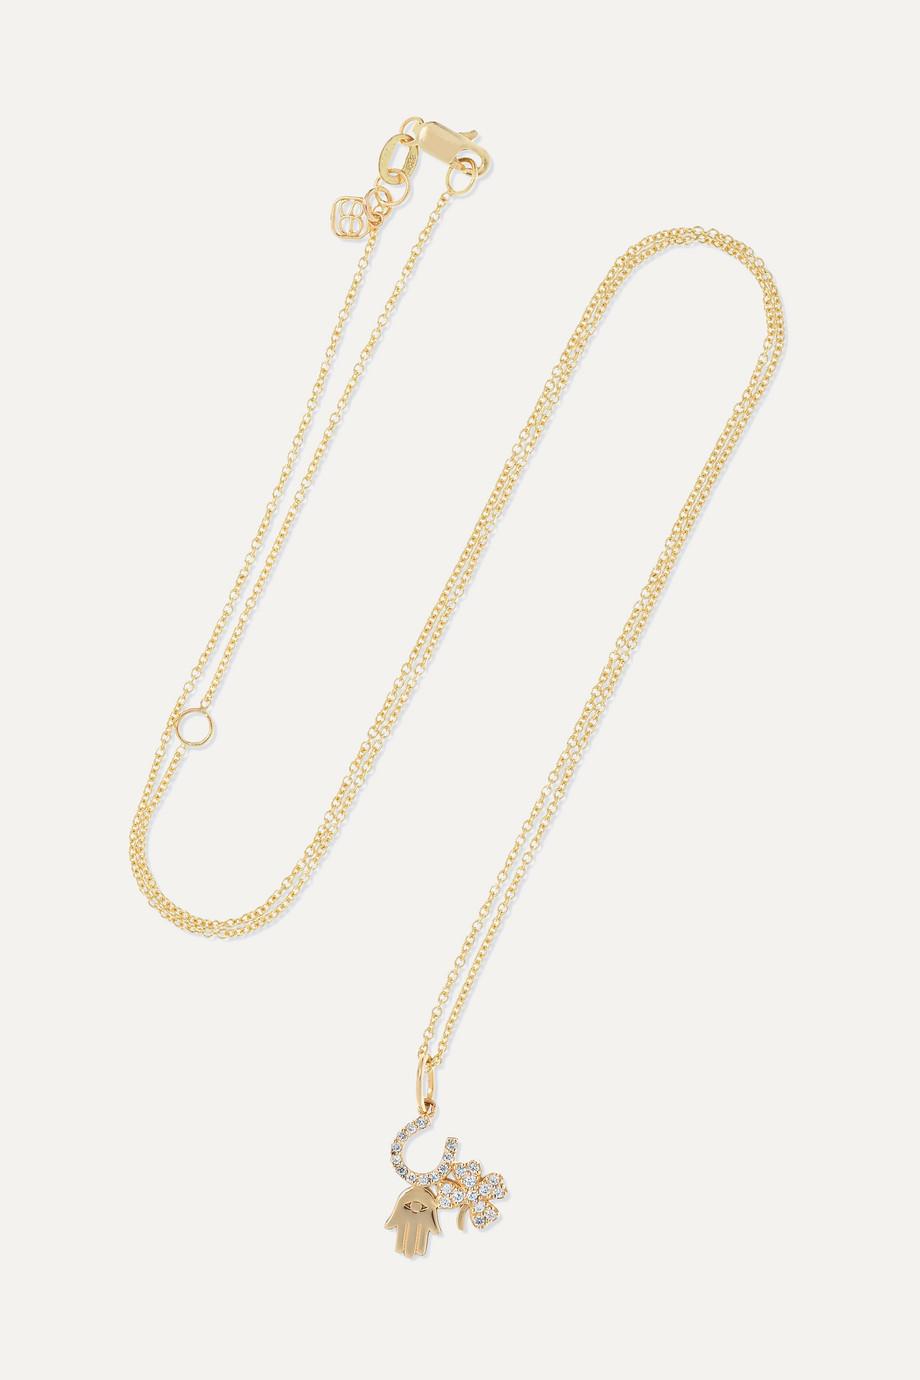 Sydney Evan Luck and Protection 14-karat gold diamond necklace